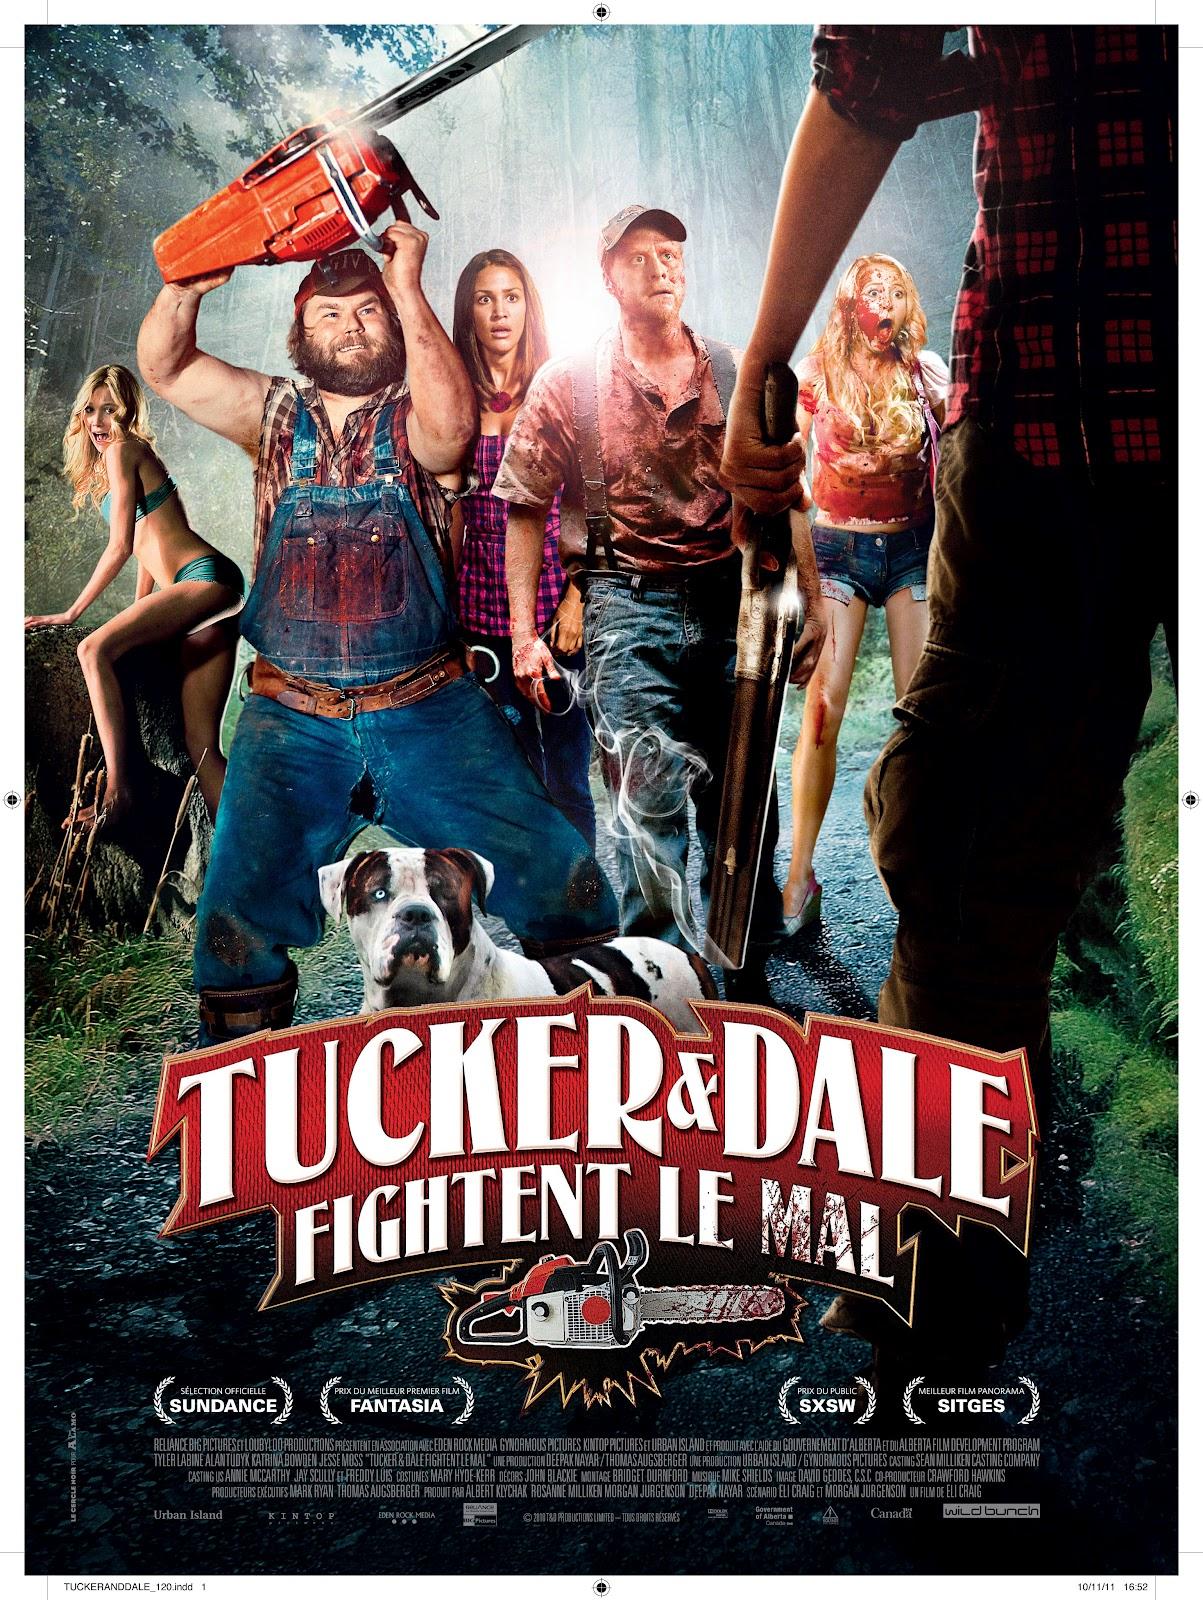 http://1.bp.blogspot.com/-2jtO6UBIWDg/Ty5uTs6xqfI/AAAAAAAAAAk/u5ttGLFgU_w/s1600/tuckeretdale_affiche.jpg